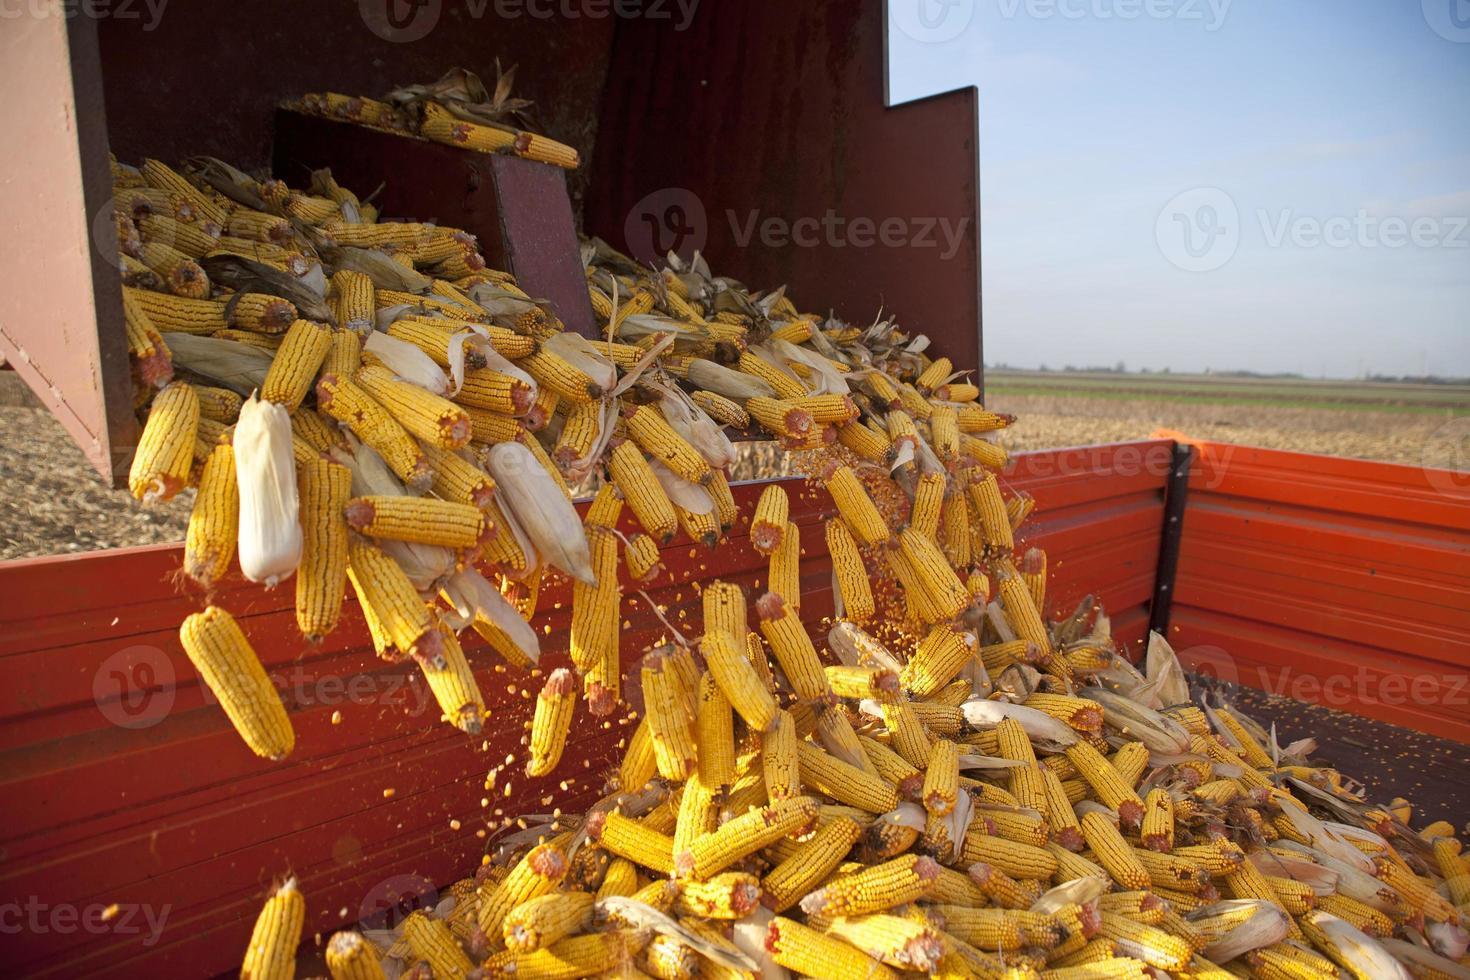 Dumping the corn cobs photo